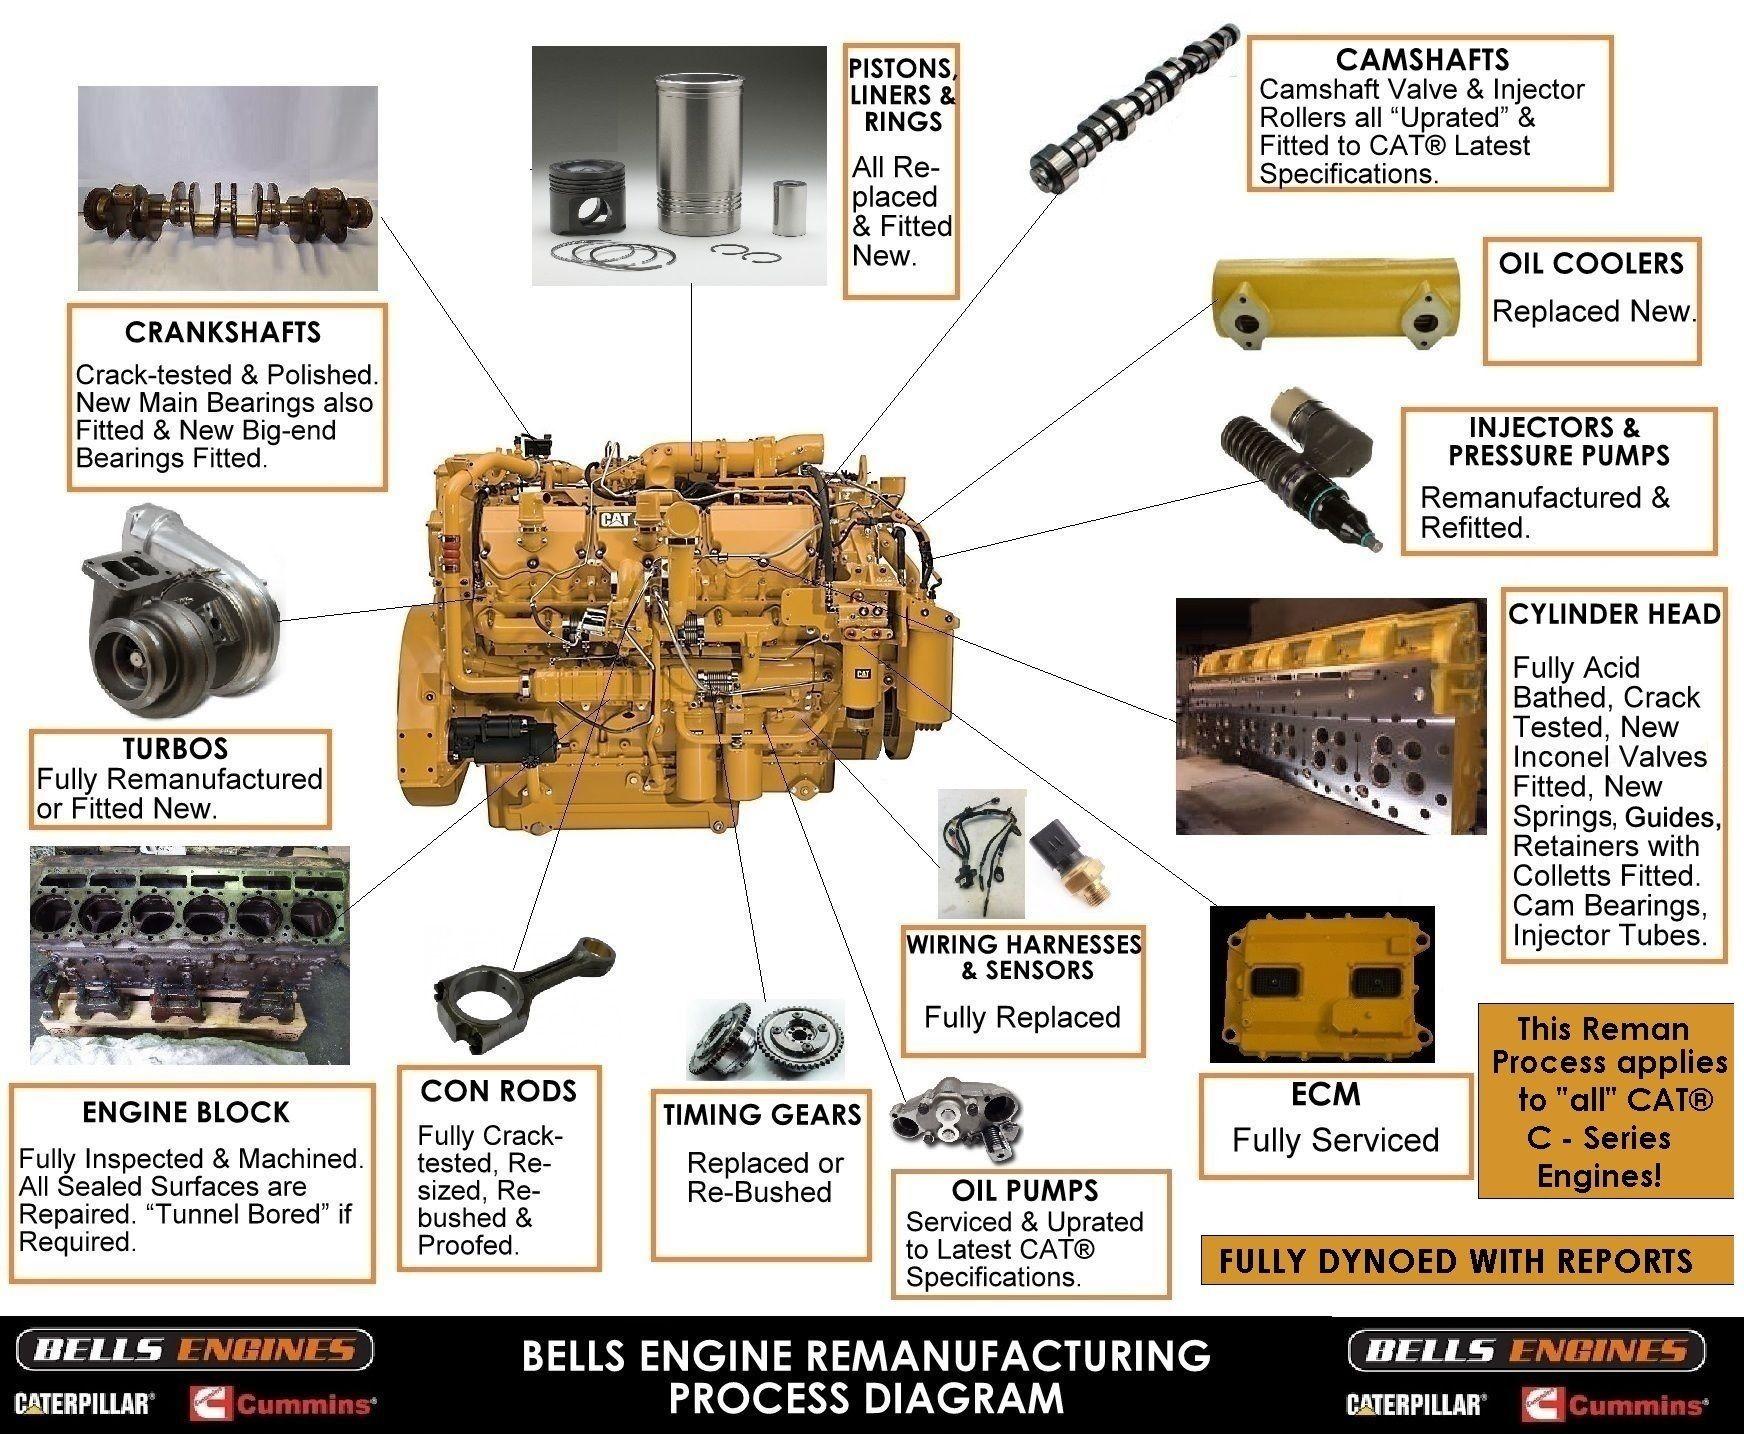 Caterpillar and Cummins Engine Remanufacturers Australia